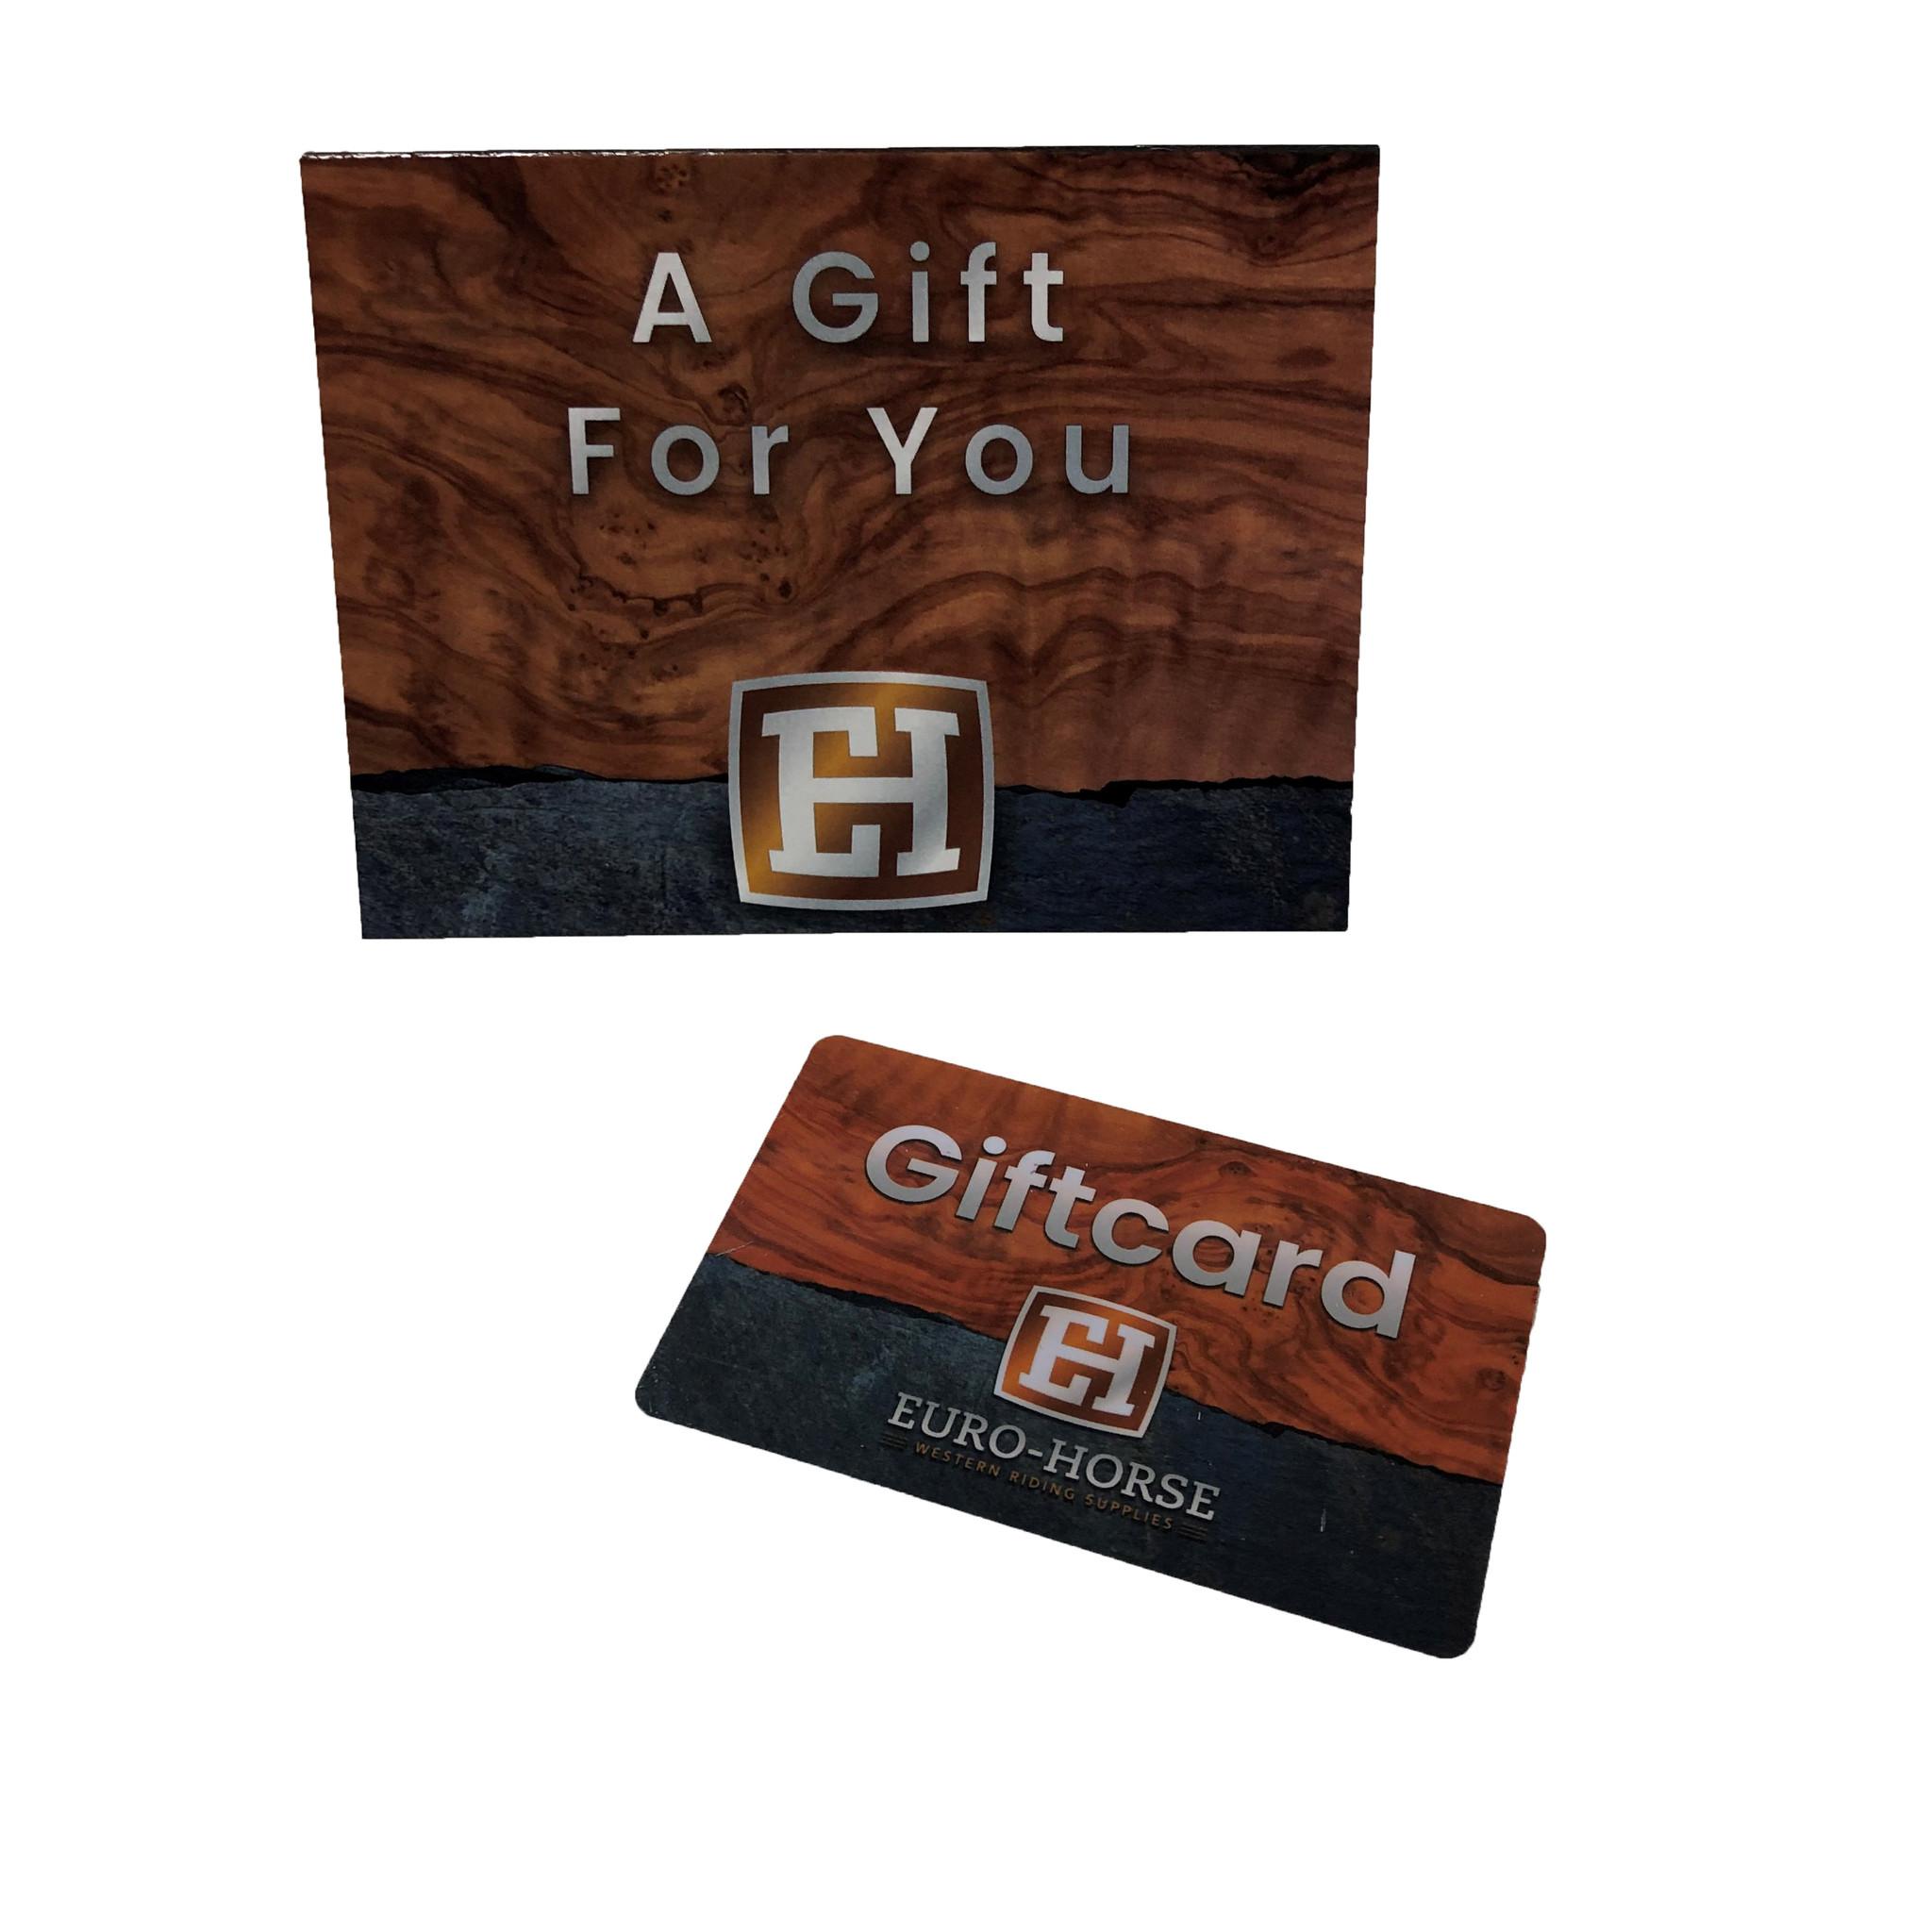 Euro-Horse western riding supplies Gift card